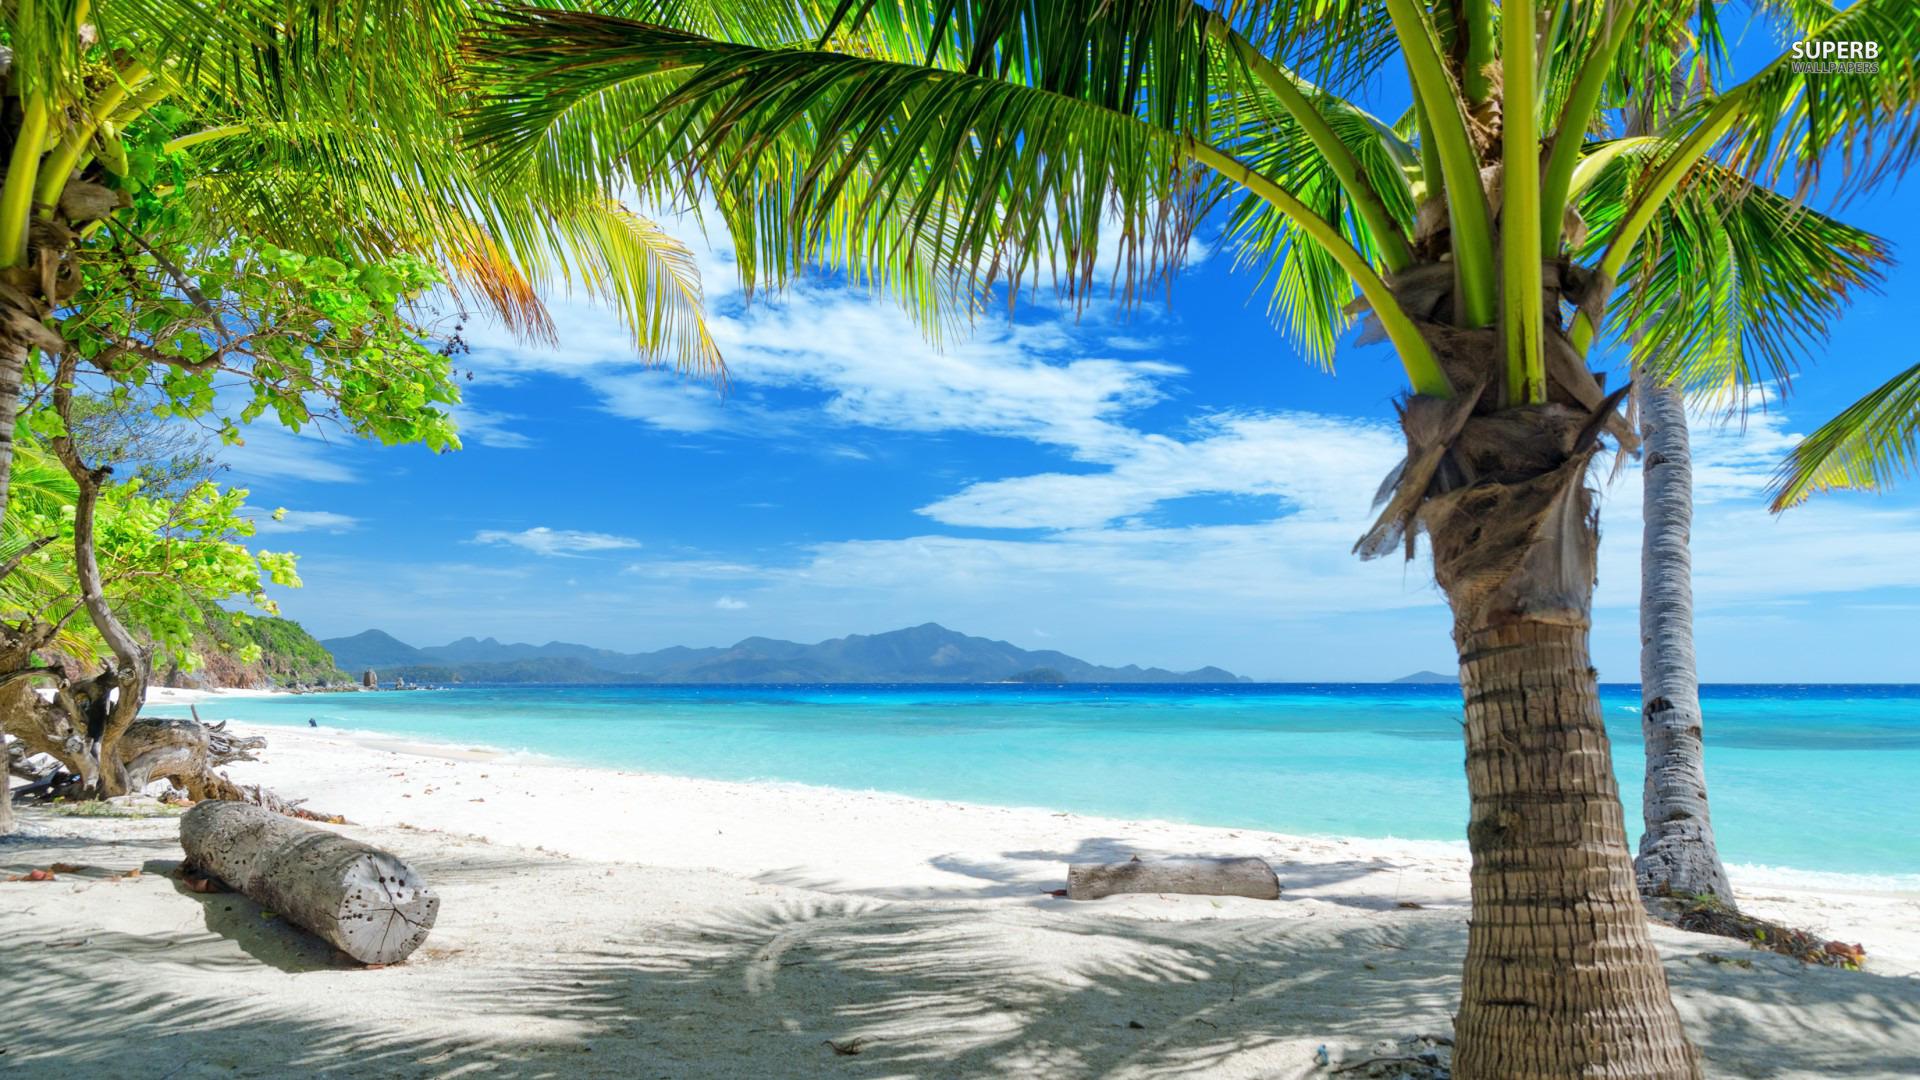 tropical desktop wallpaper HD